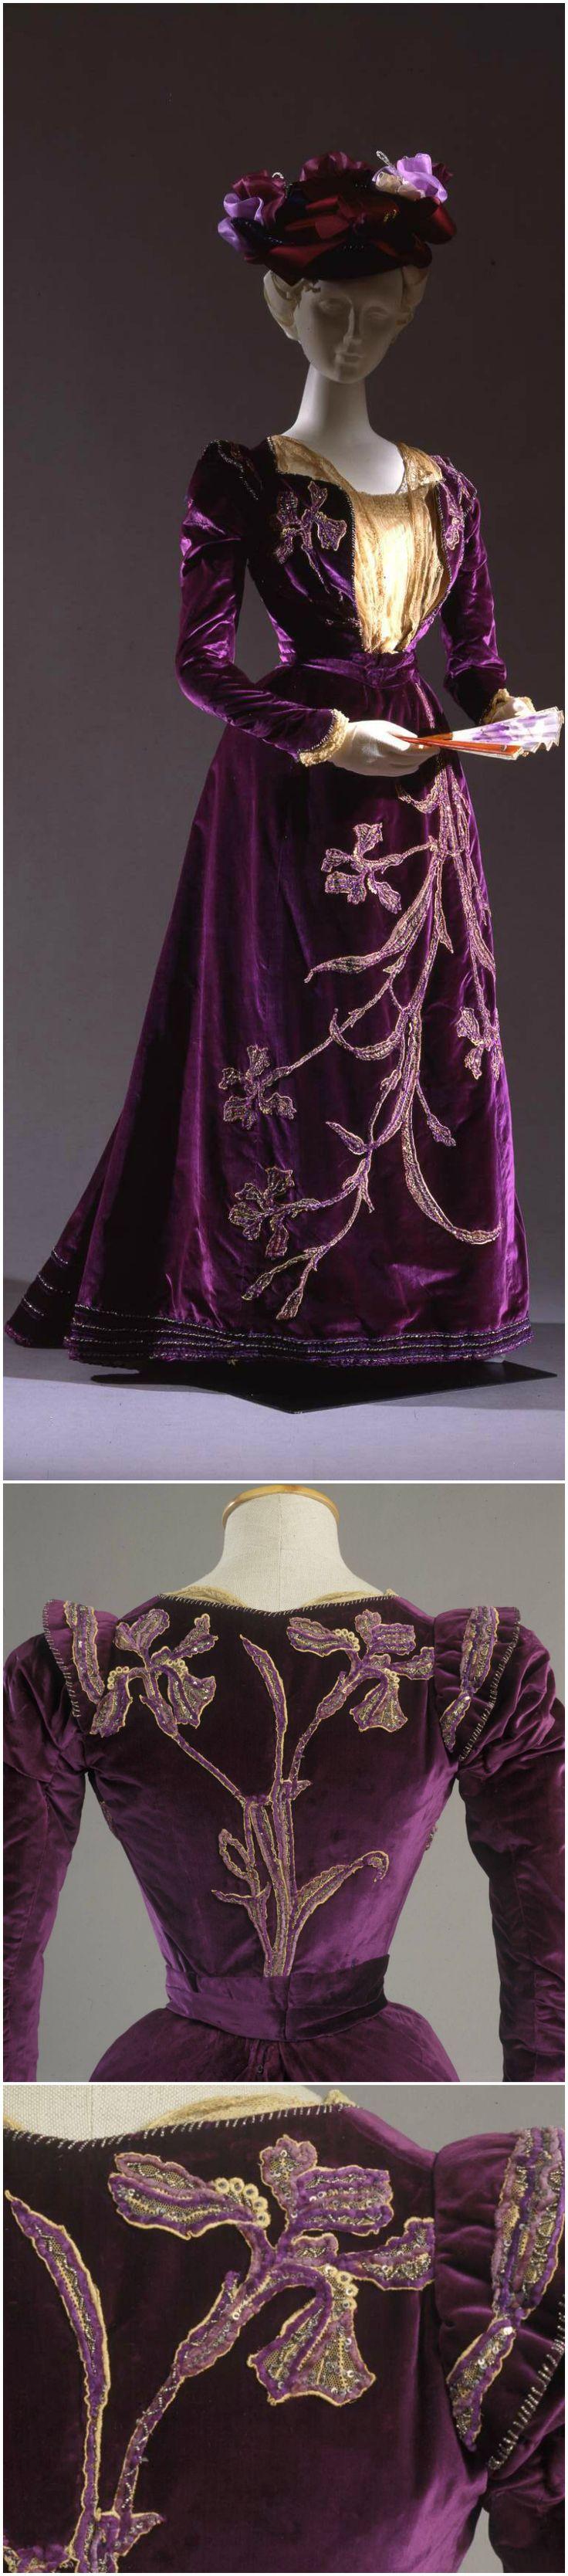 Two-piece walking dress, by Sartoria B. Pontecorvo, Rome, beginning of the 20th century (before 1906), at the Pitti Palace Costume Gallery. Via Europeana Fashion.